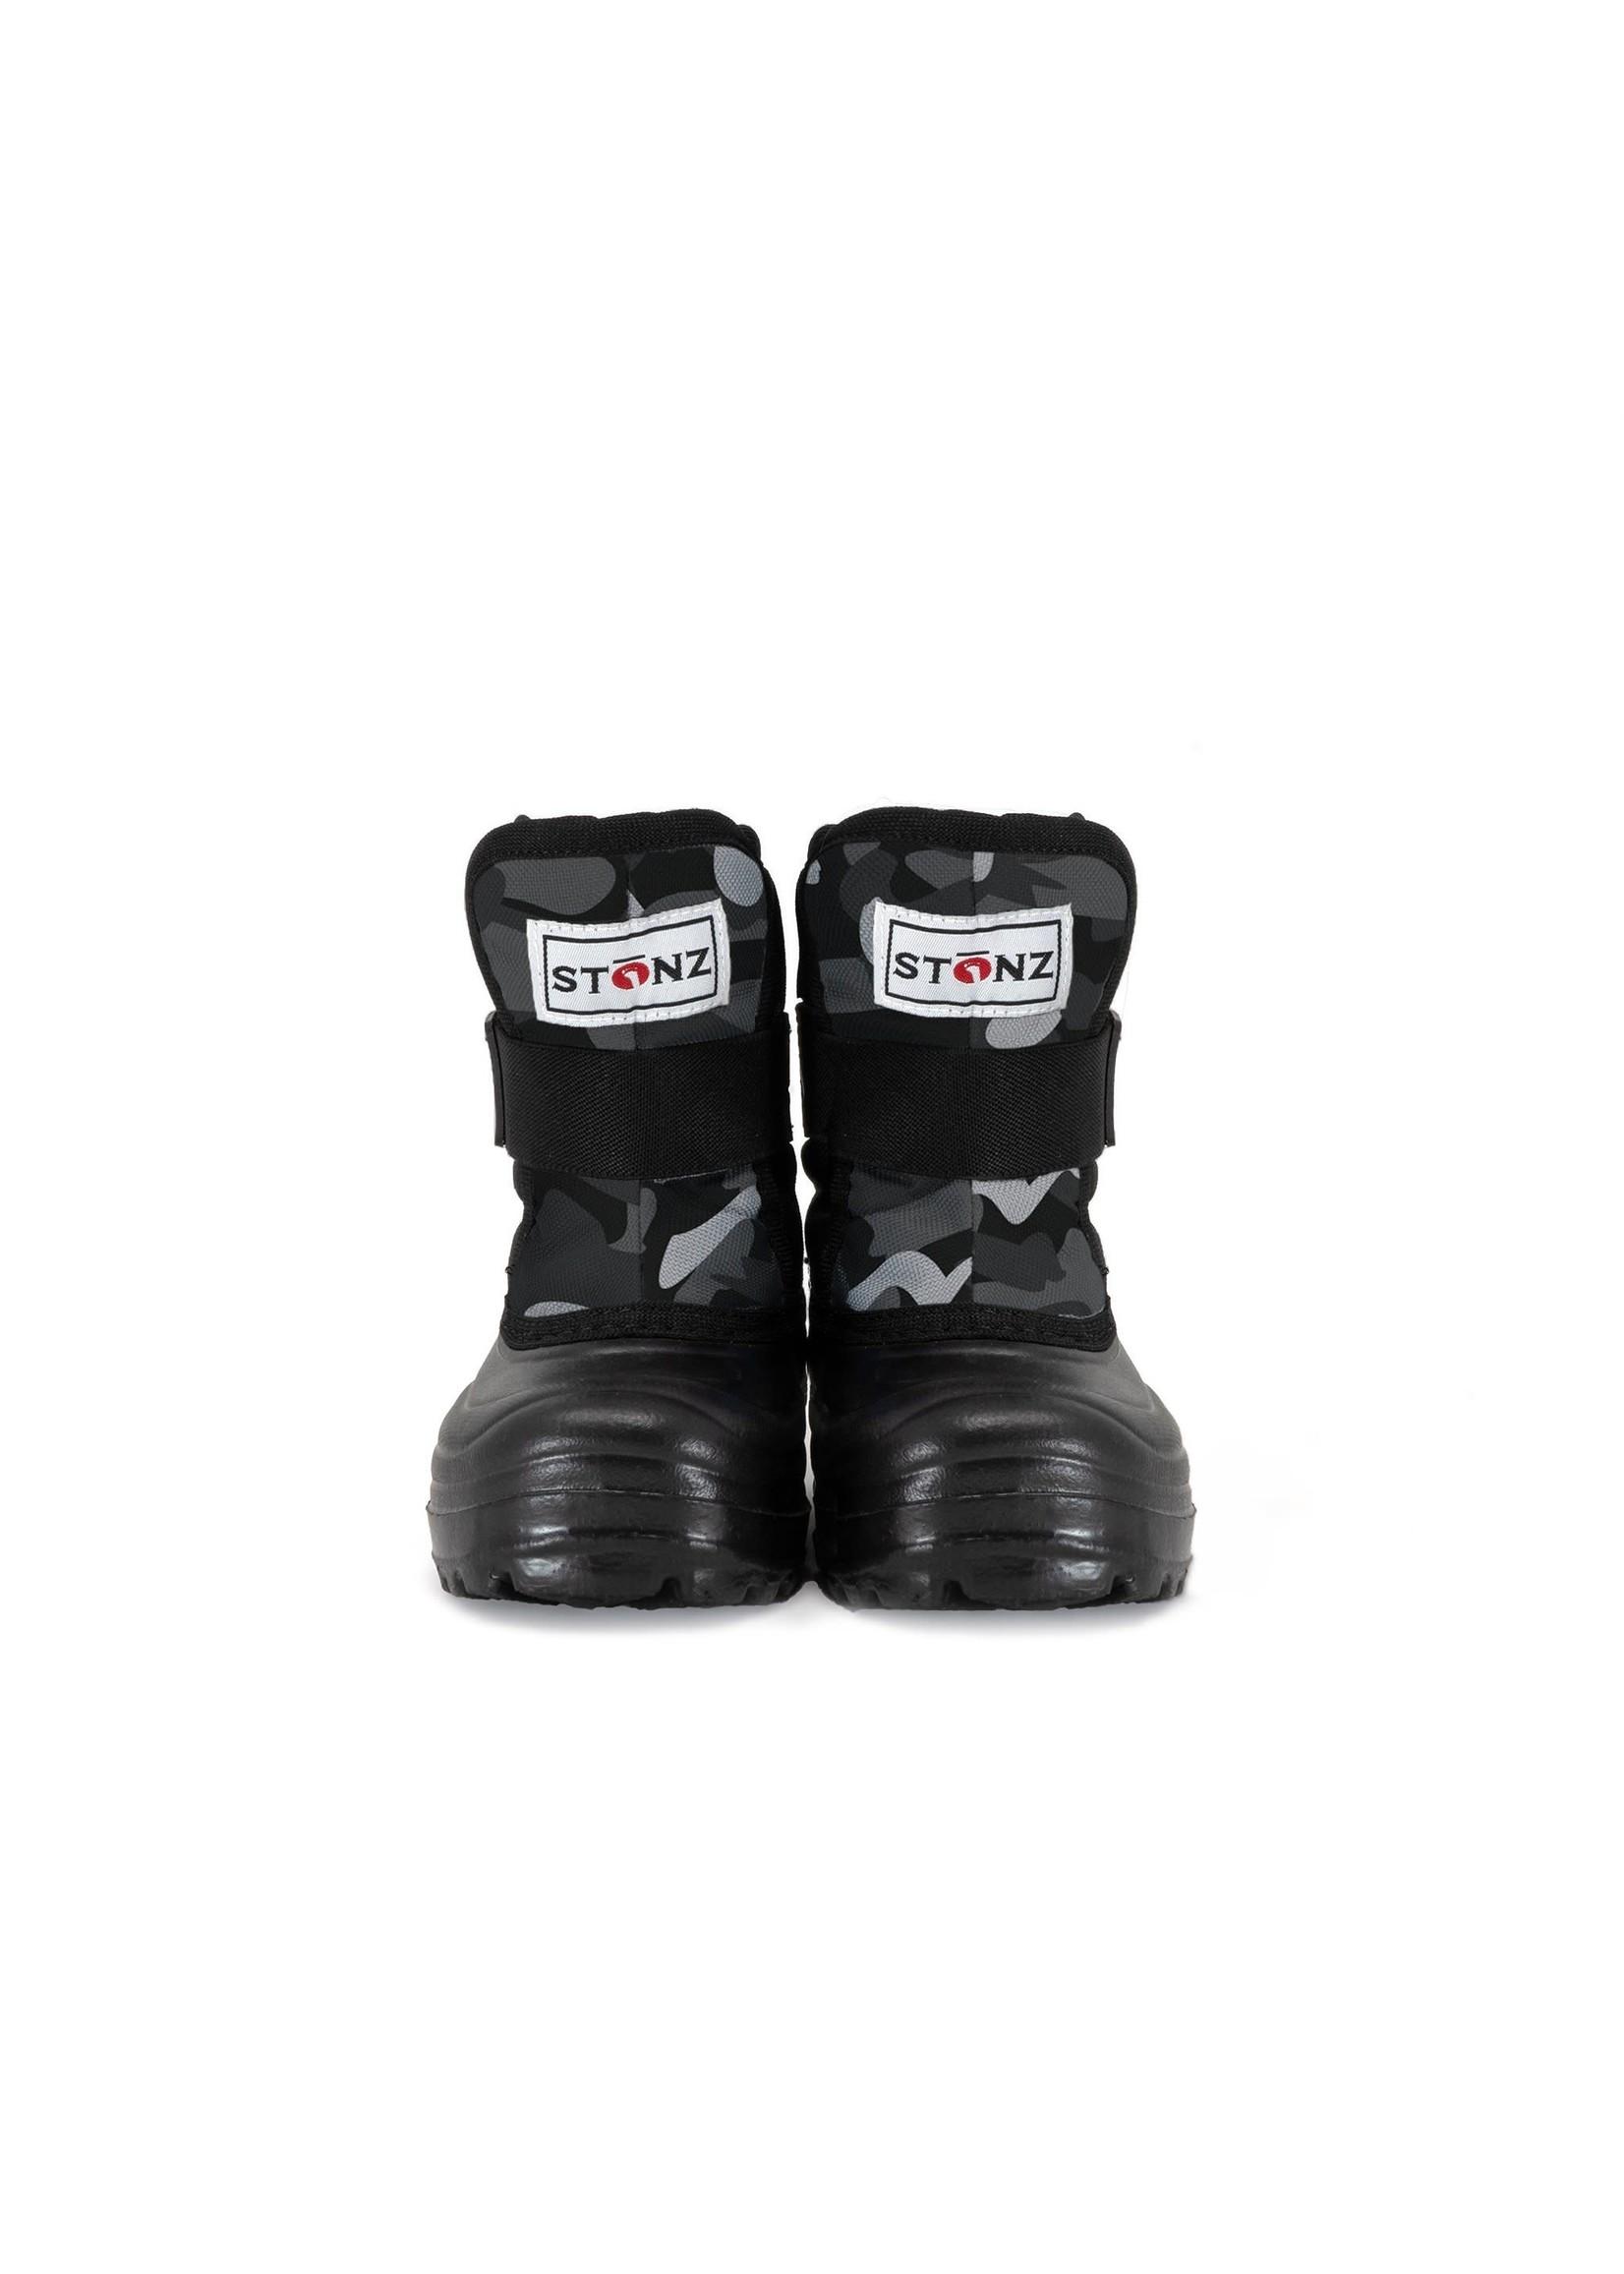 Stonz Boots (Camo)